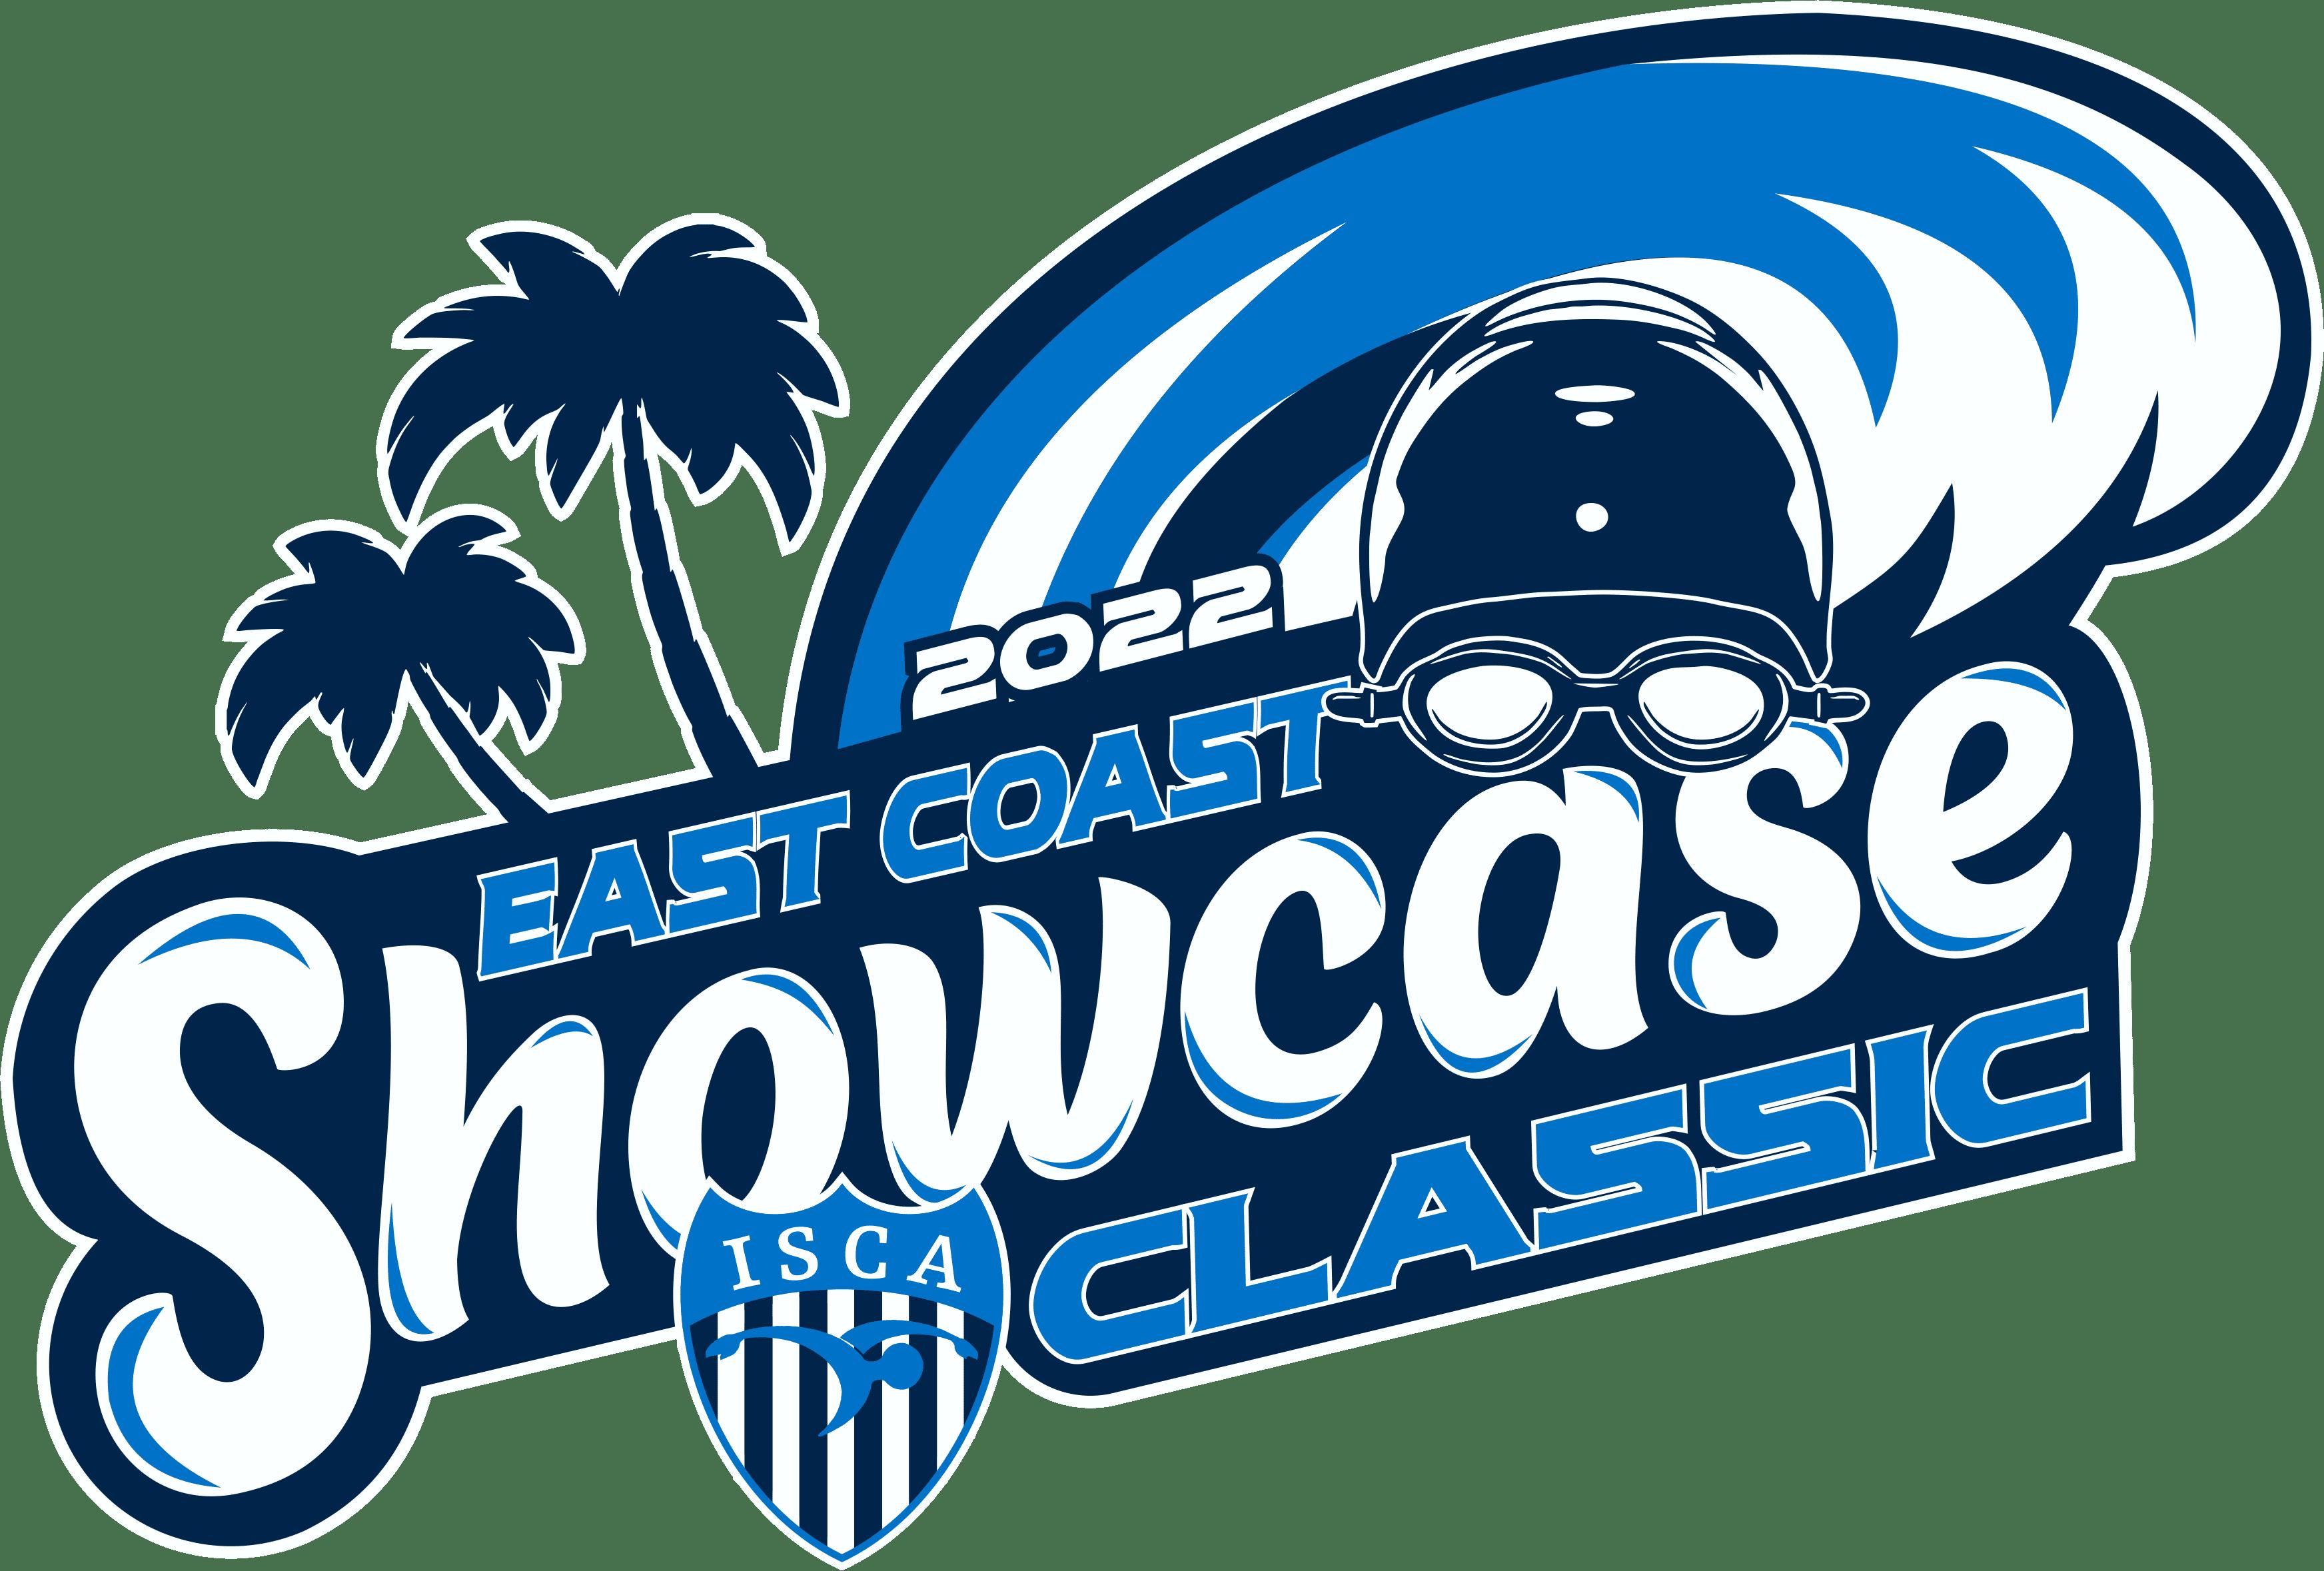 ISCA Elite Showcase Classice, East, 2022 logo